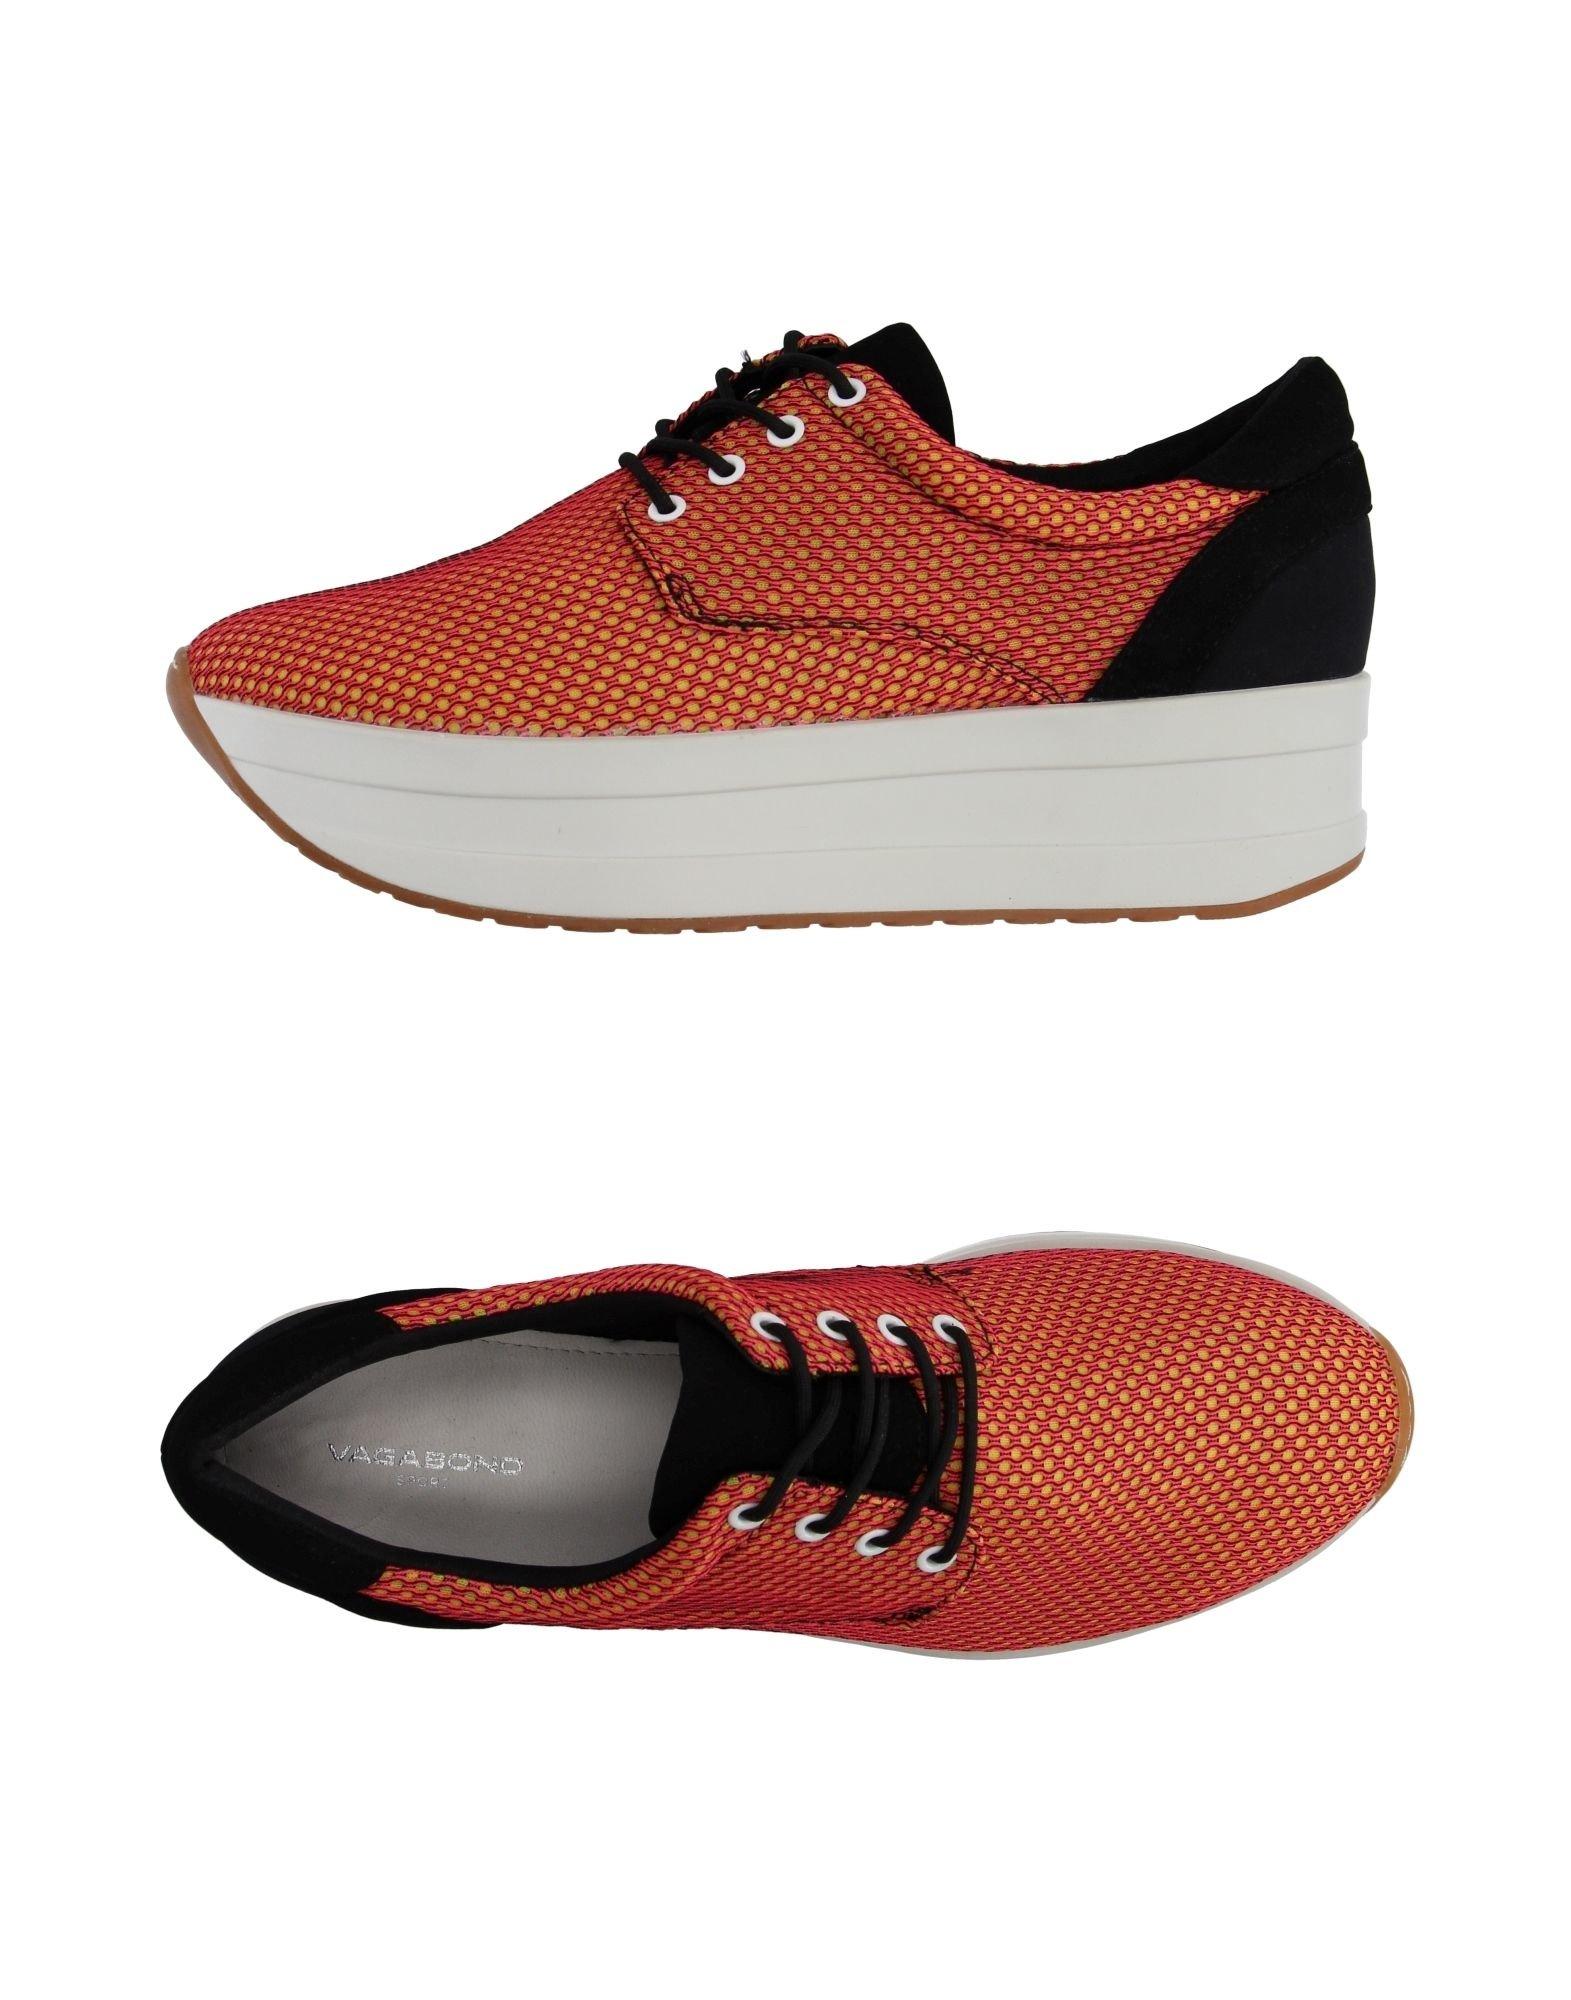 Vagabond Low-tops & Sneakers in Orange for Men